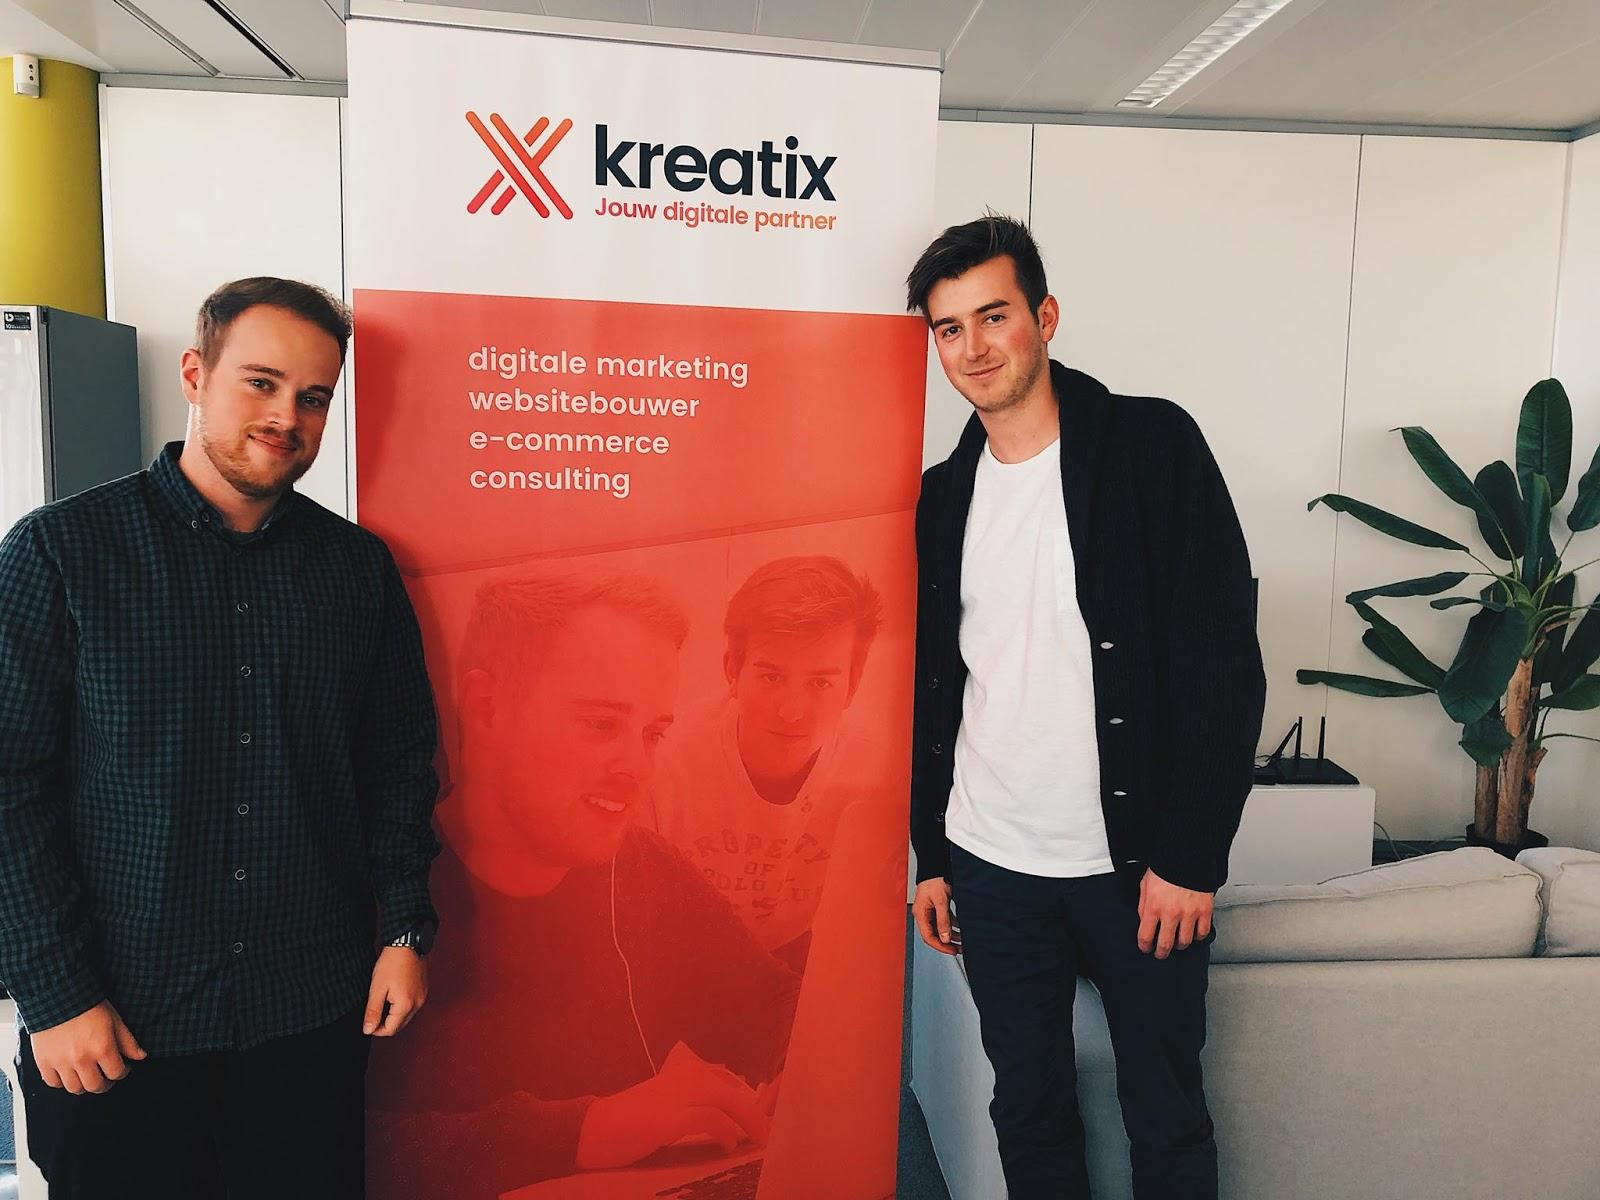 kreatix-poster